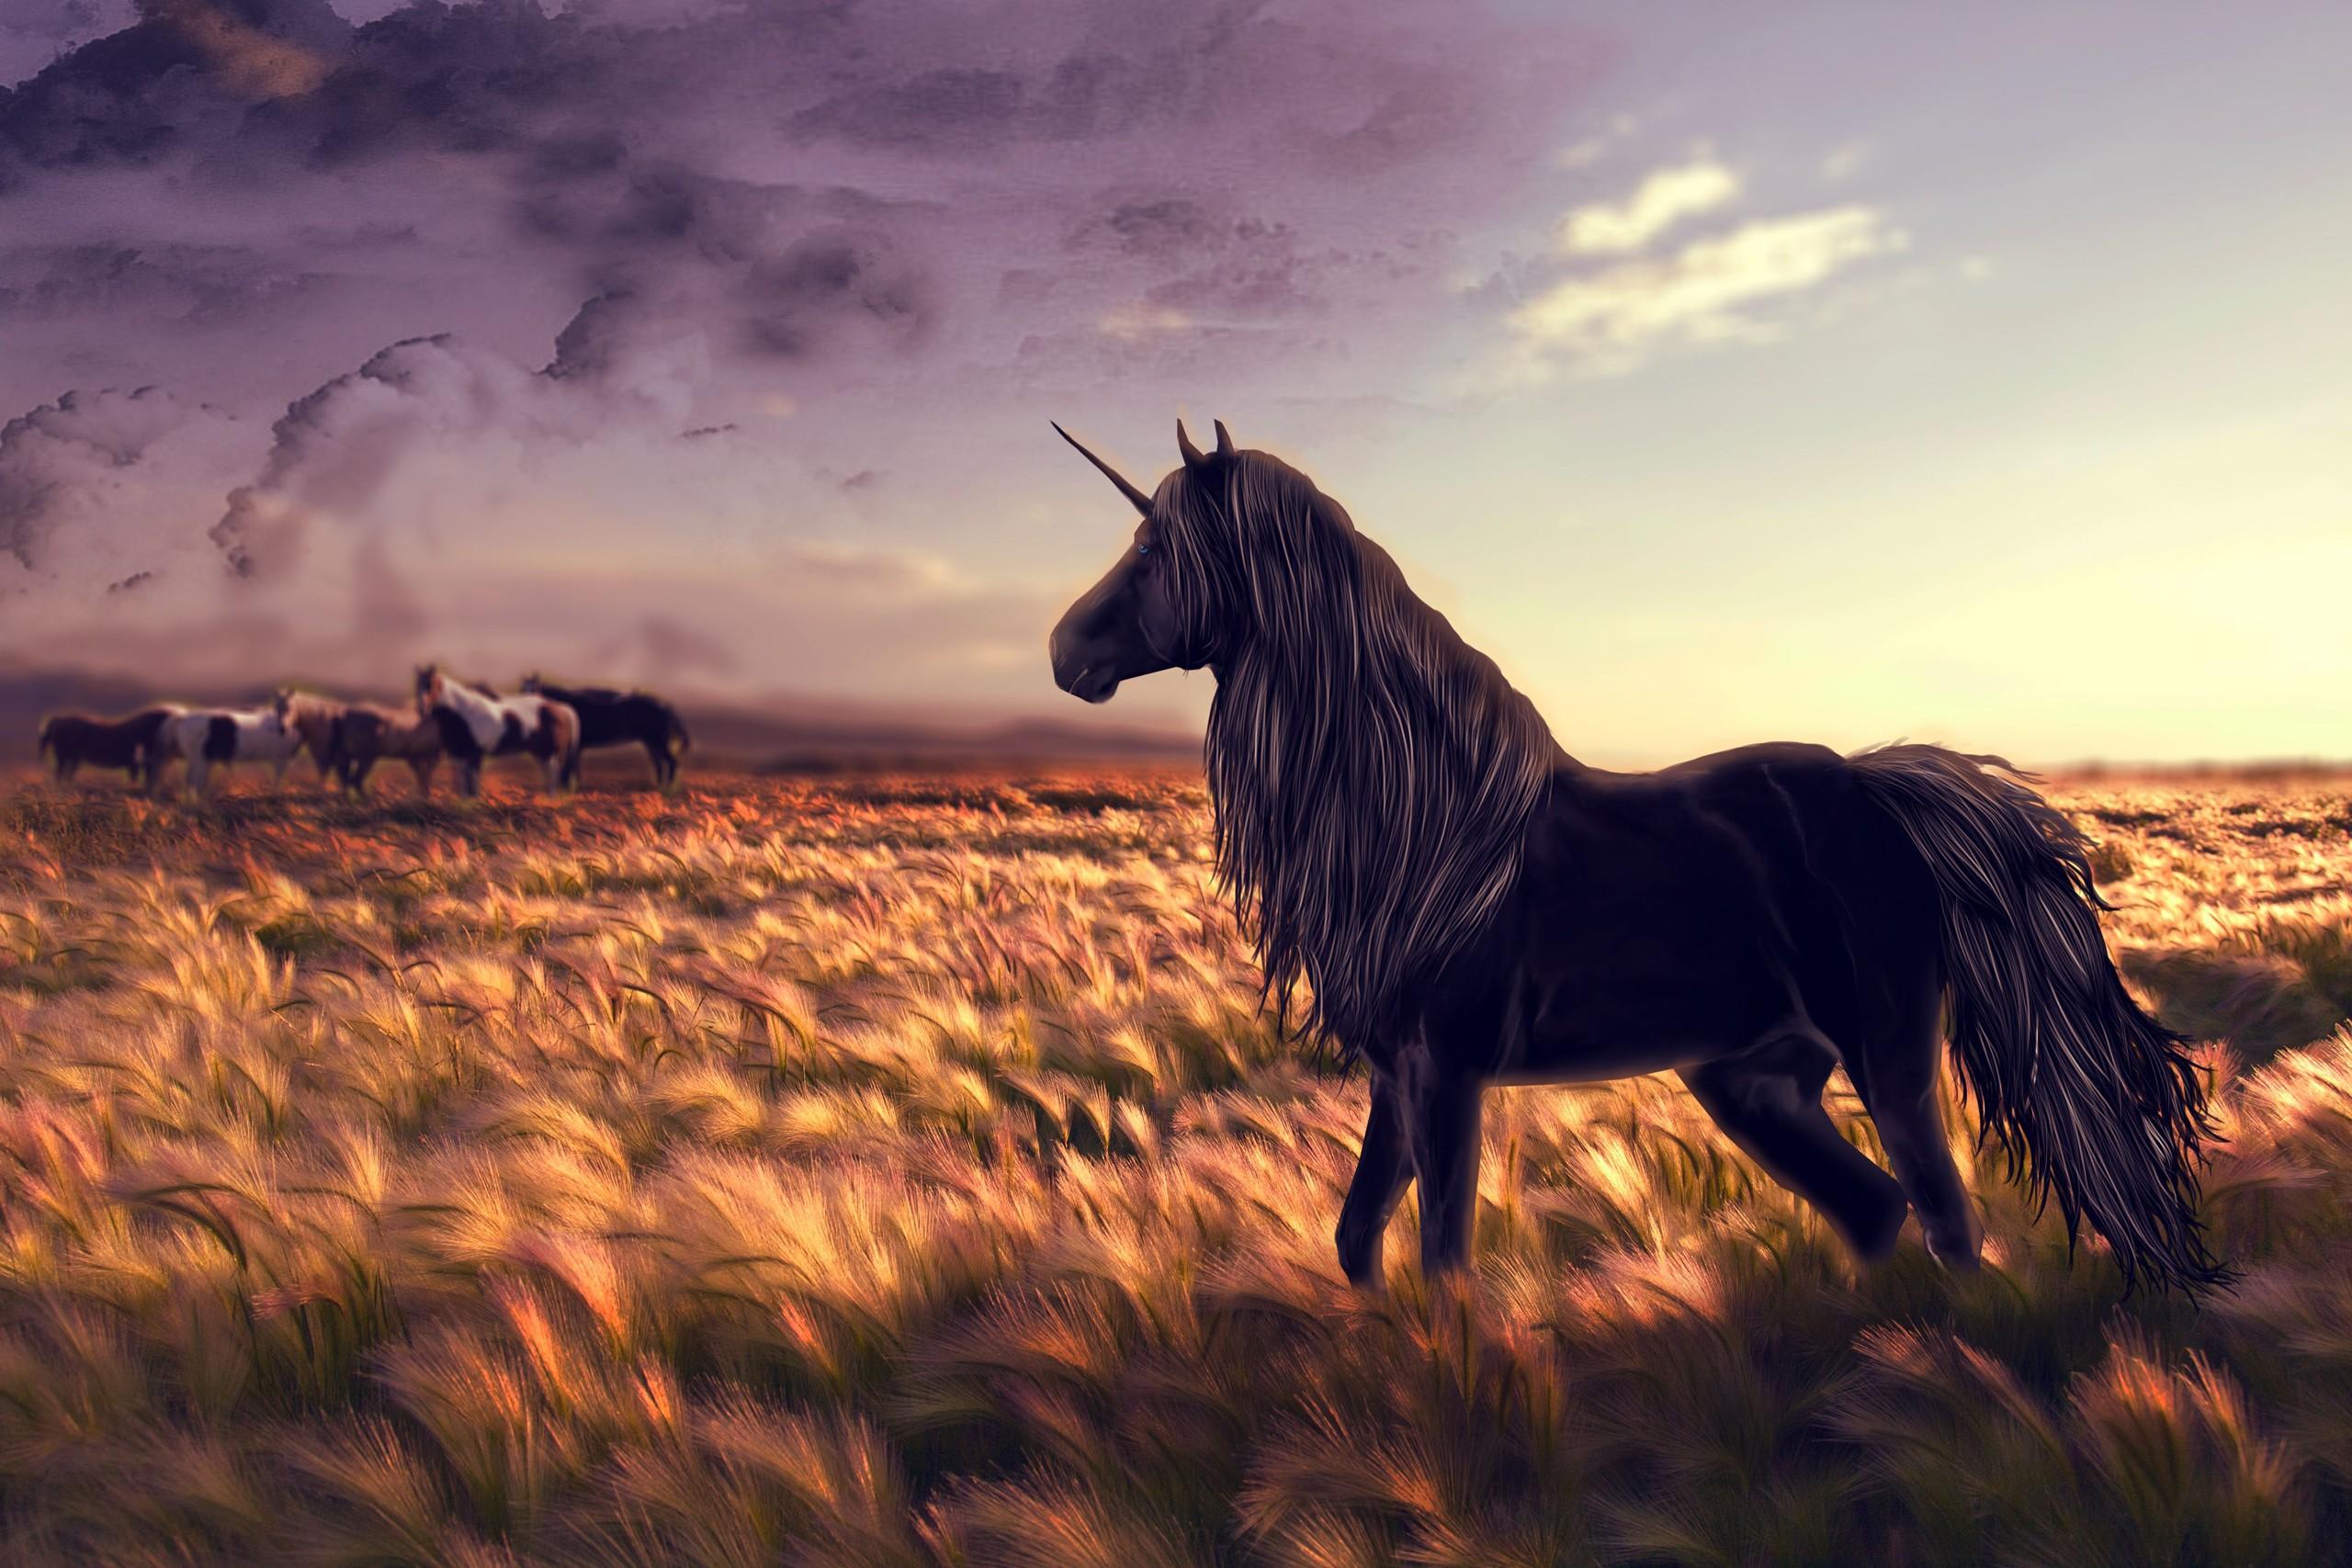 Cool Wallpaper Horse Unicorn - black-unicorn-hd-desktop-wallpaper  You Should Have_525963.jpg